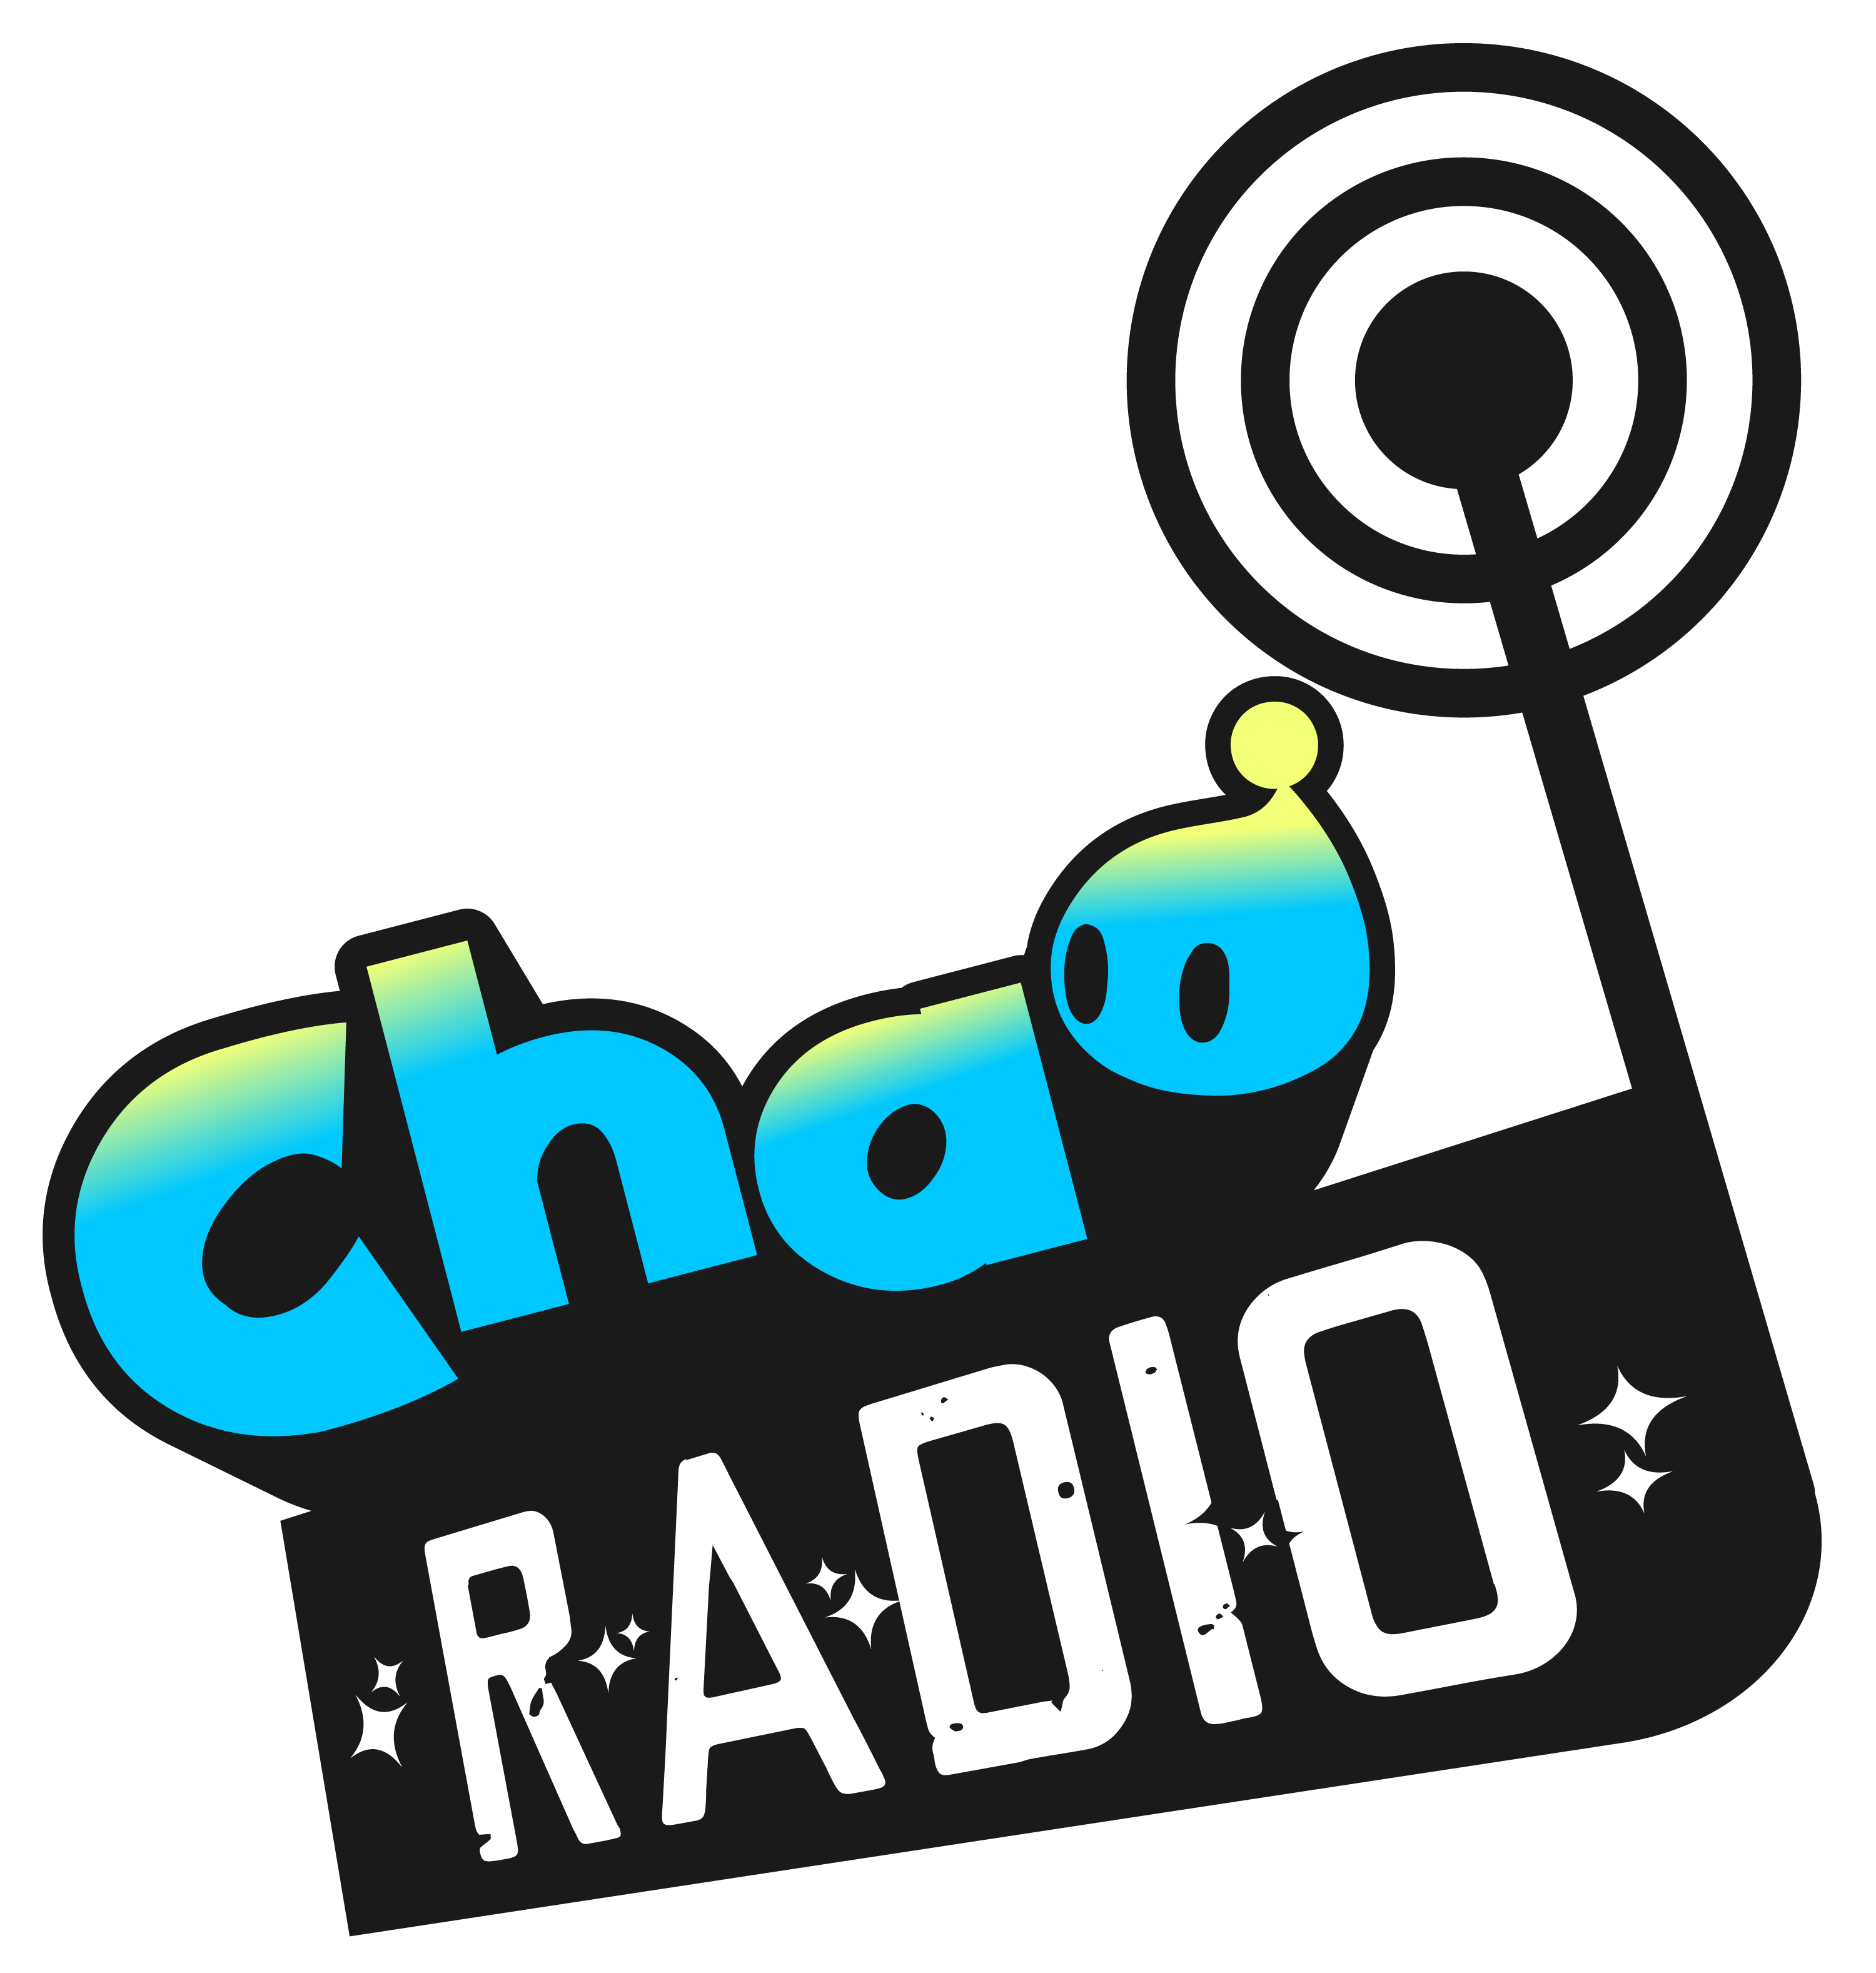 Chao Radio Logo by NuryRush